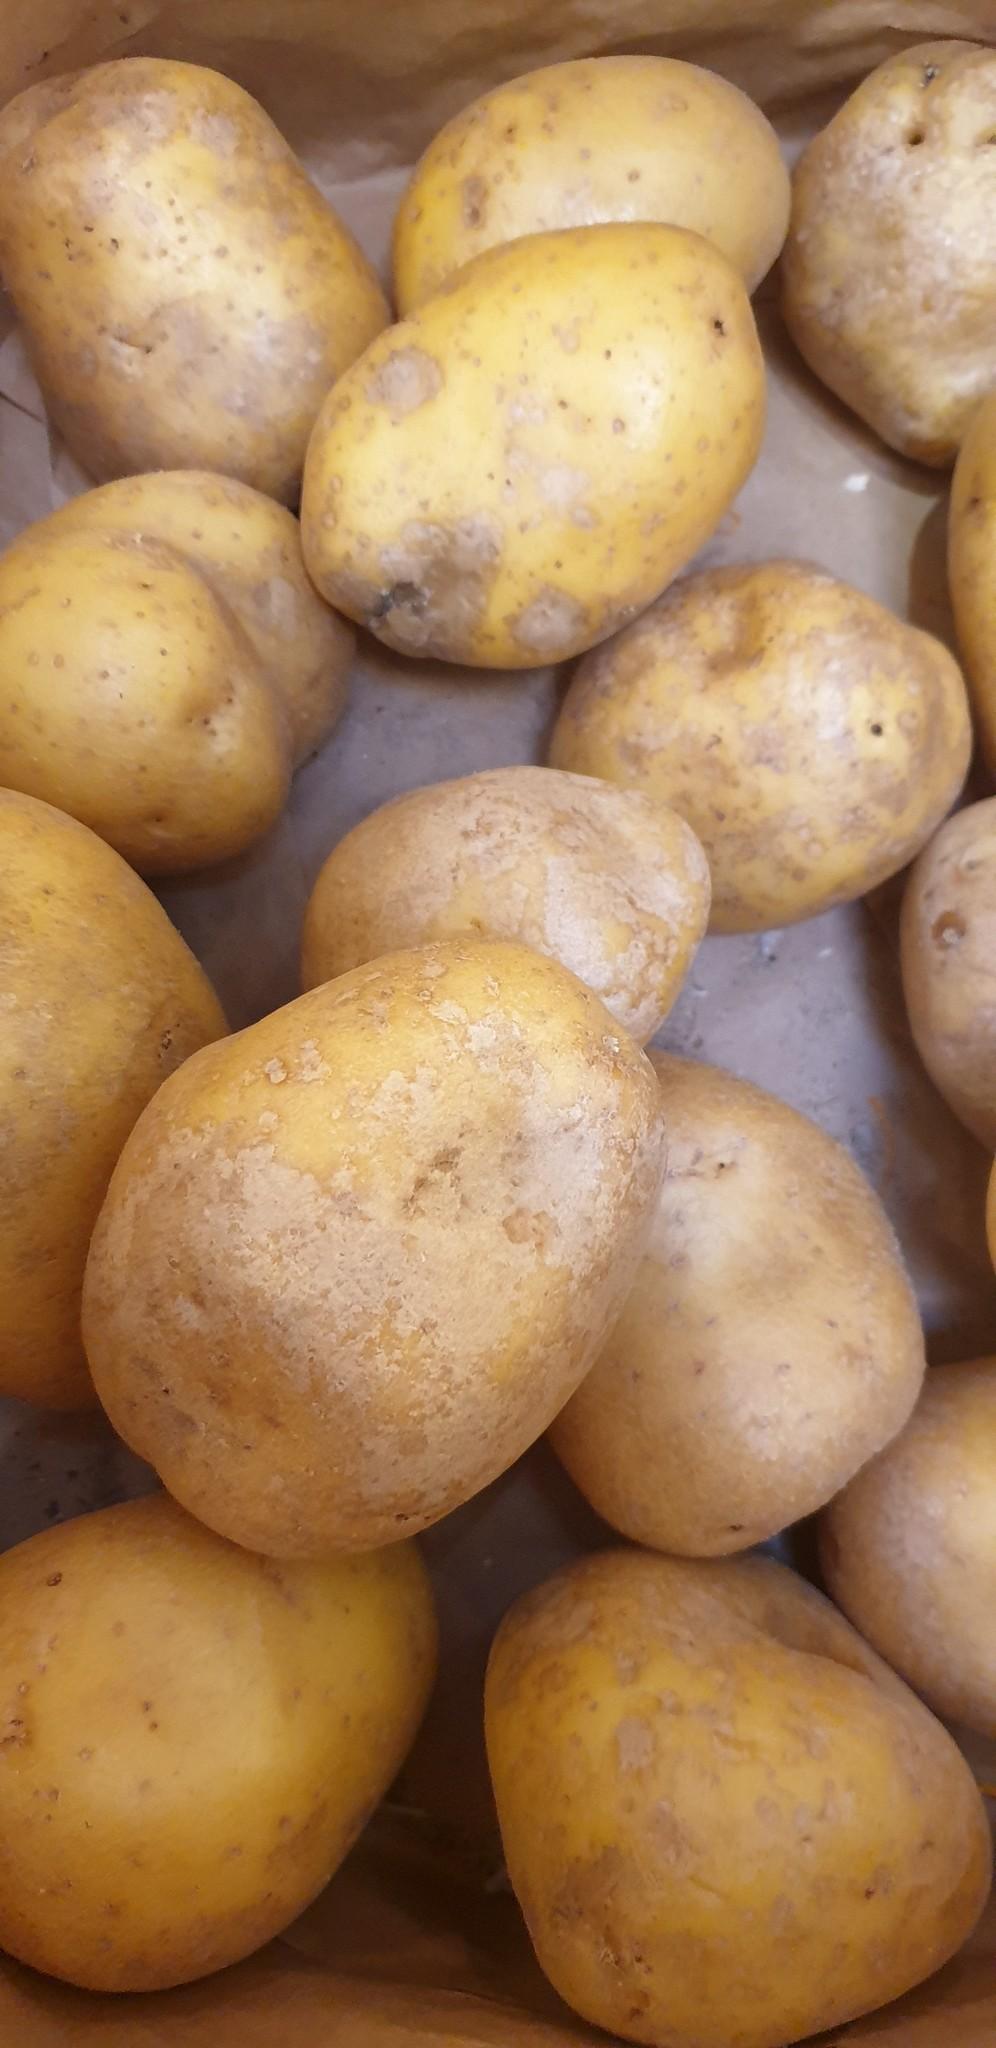 Kartoffel Agria Jumbo mehligkochend (CH)